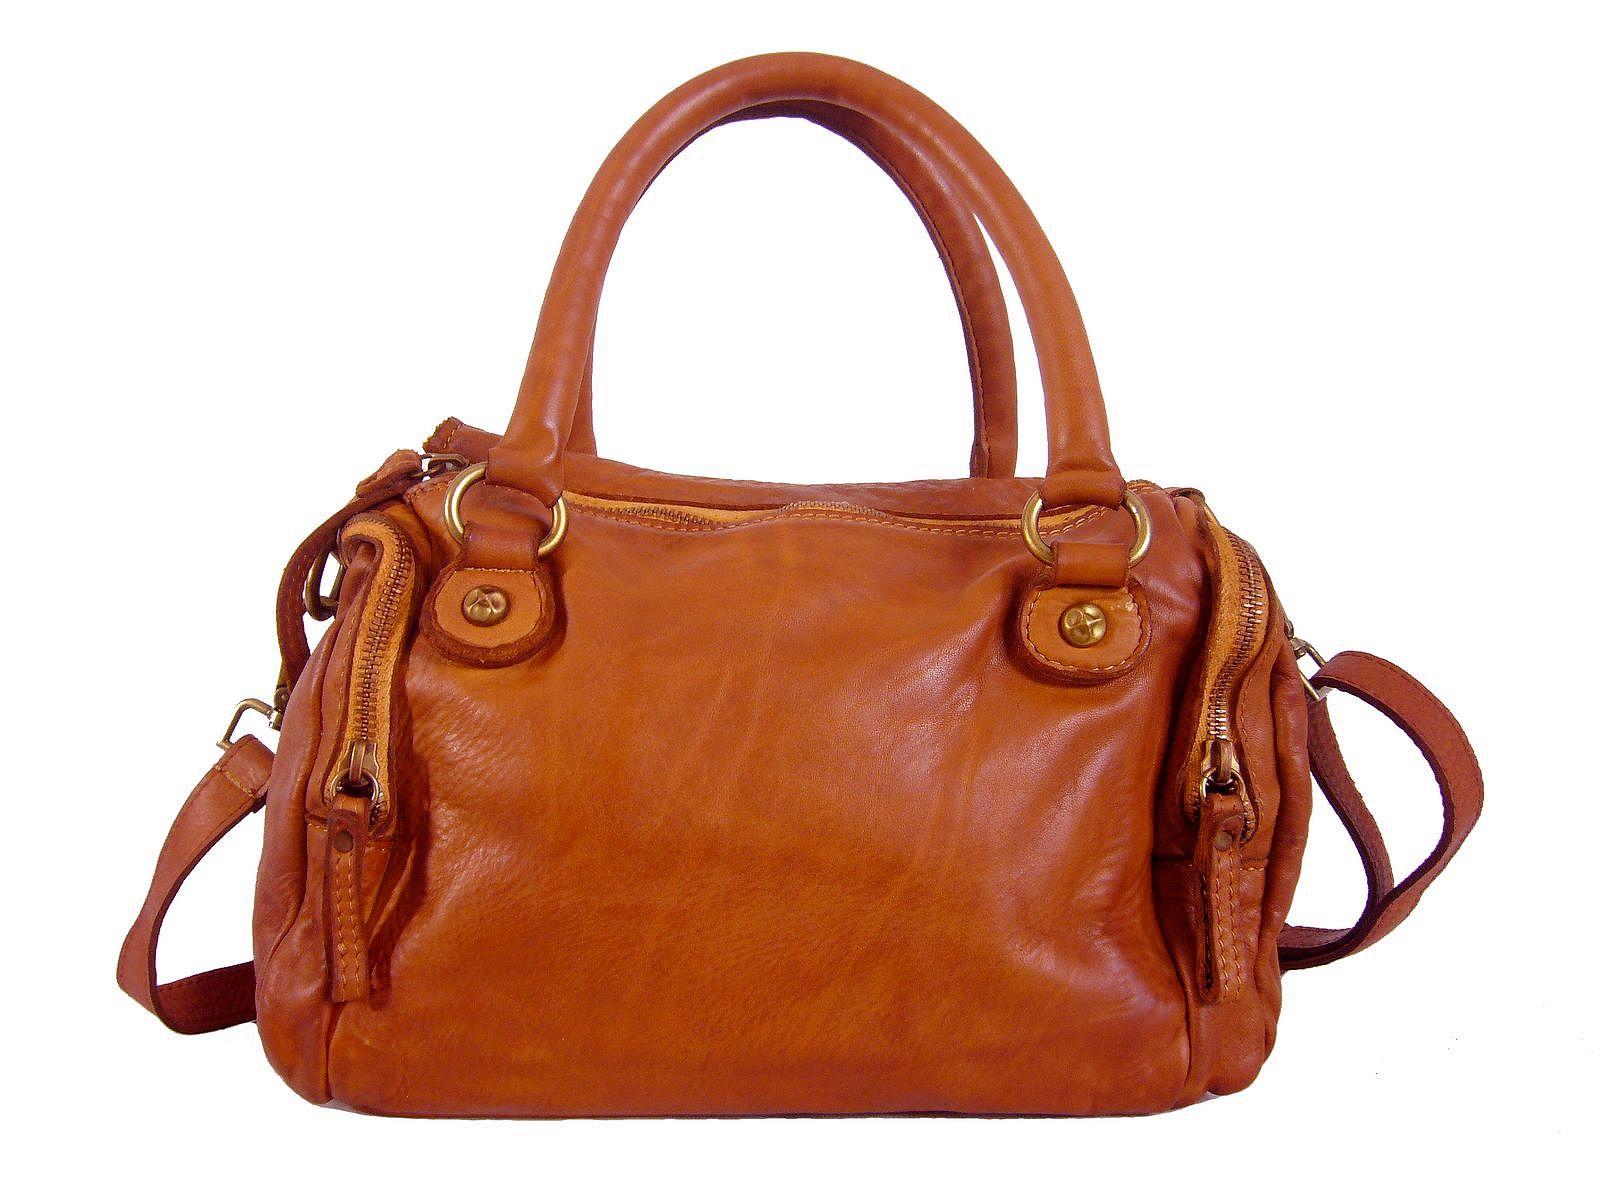 426dee4a2 Maroquinerie Femme cuir: Sacs & accessoires   Espritcuir.com